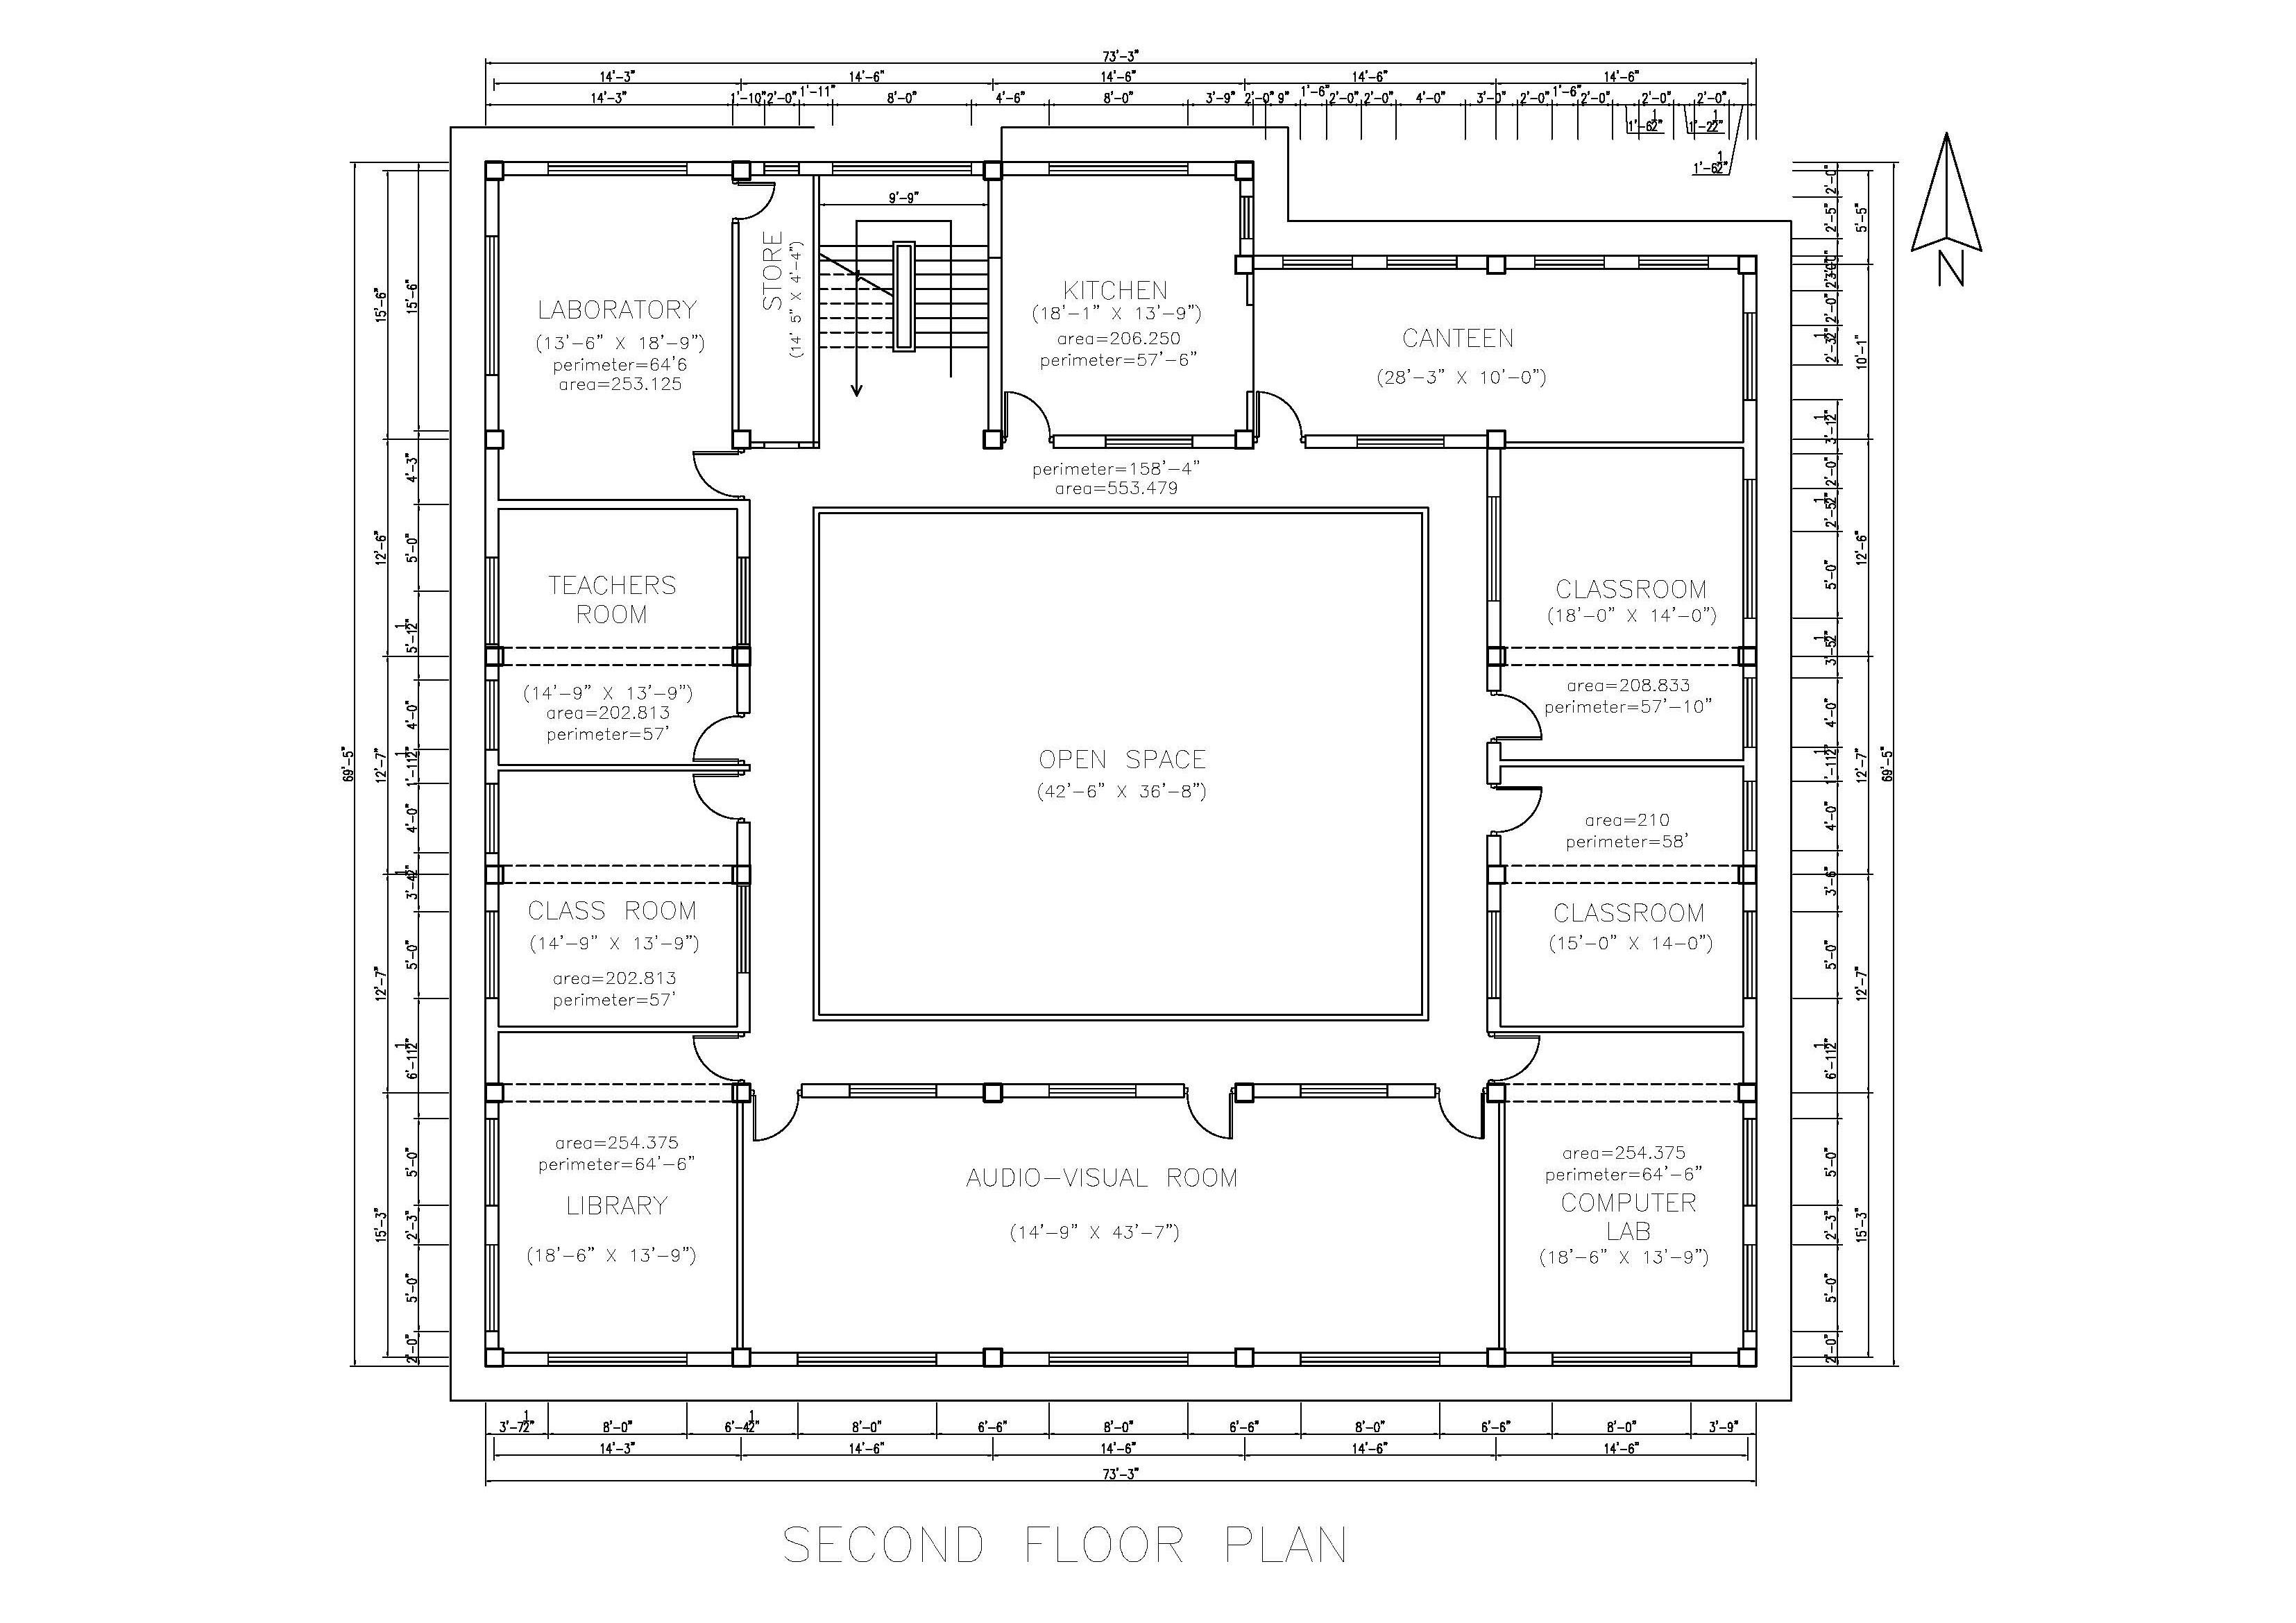 Phulchoki-New-Second-Floor-Plan_2